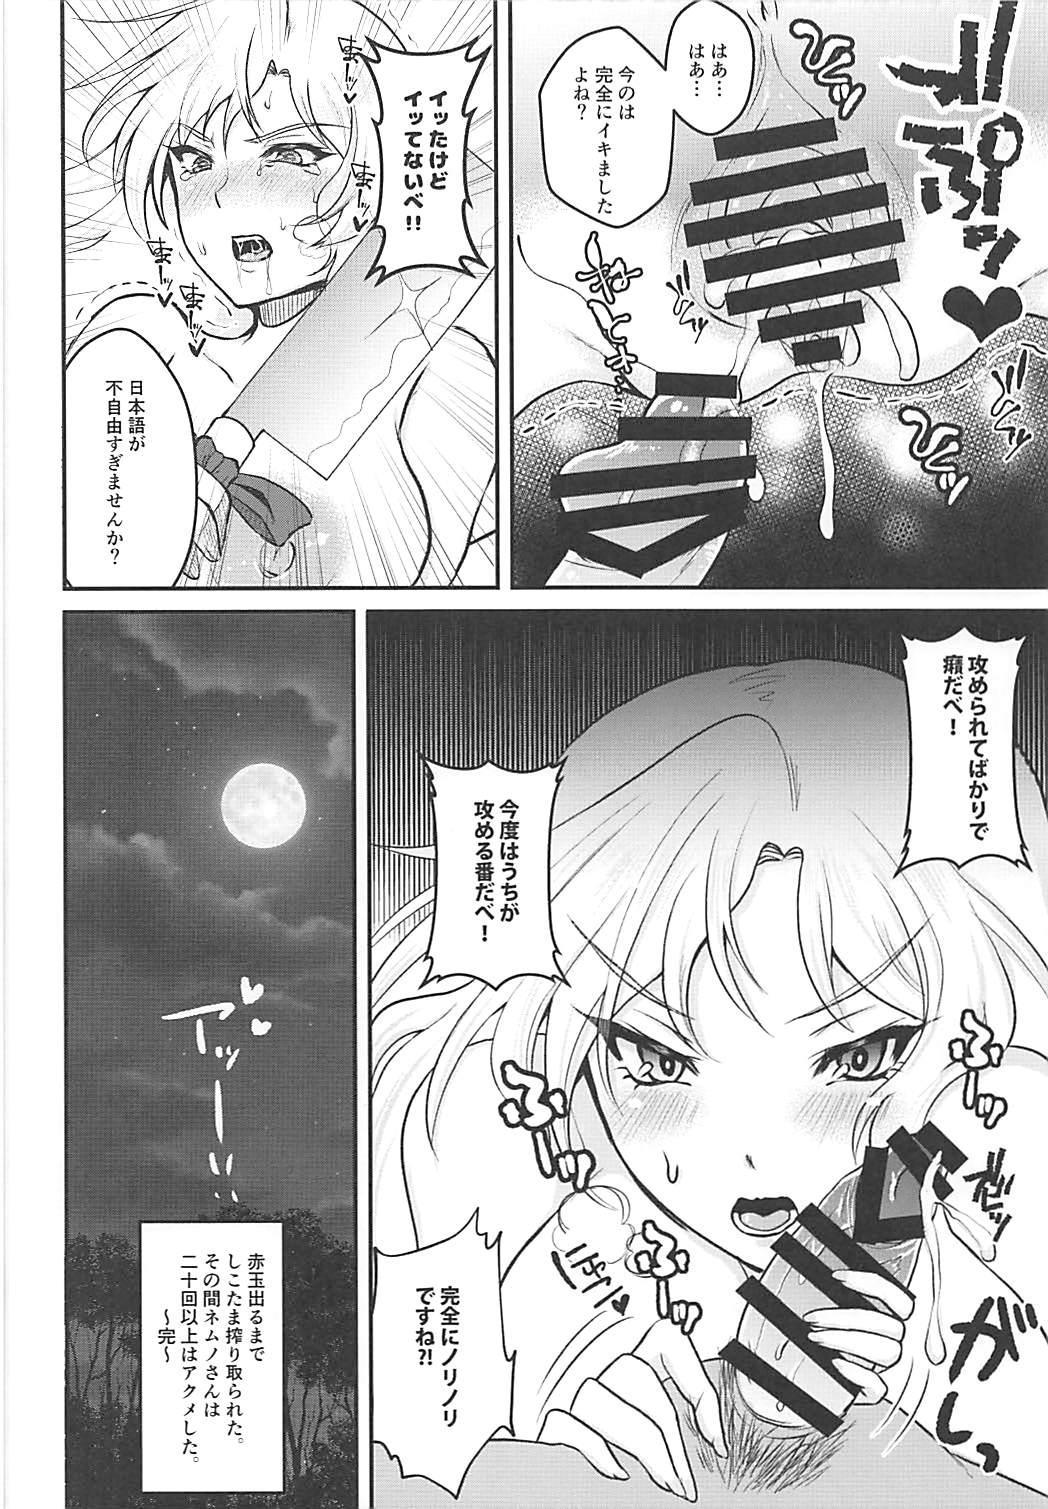 Nemuno-san wa Ikimakuritai! 12